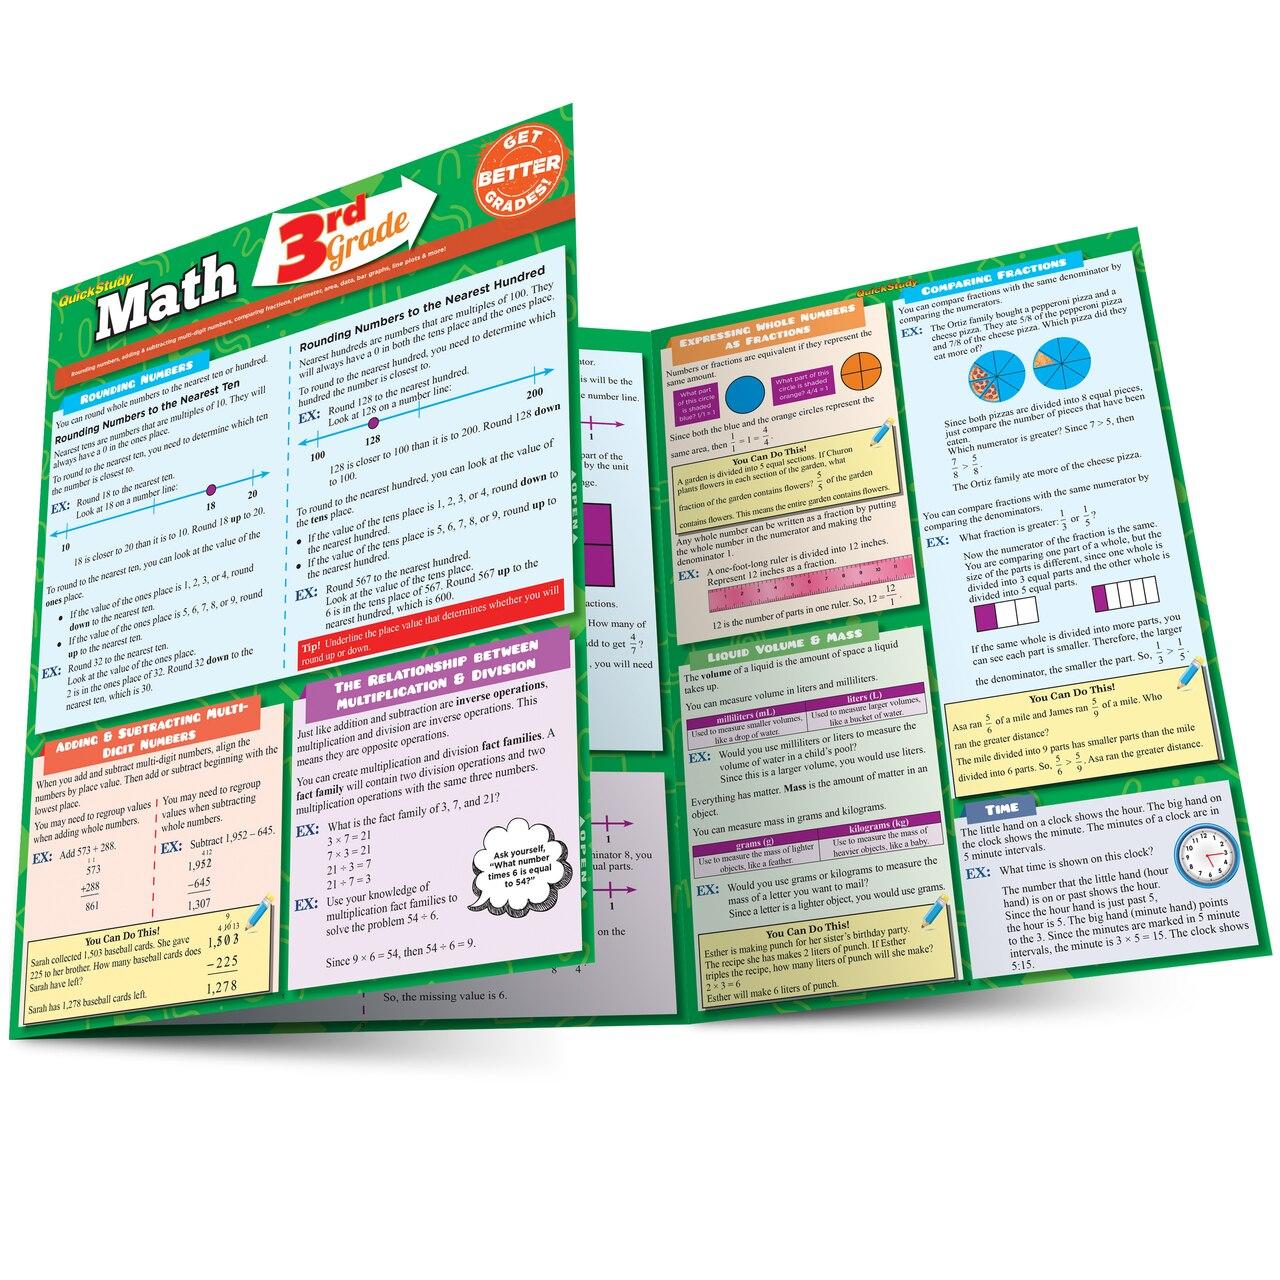 Quick Study QuickStudy Math: 3rd Grade Laminated Study Guide BarCharts Publishing Mathematics Study Outline Main Image